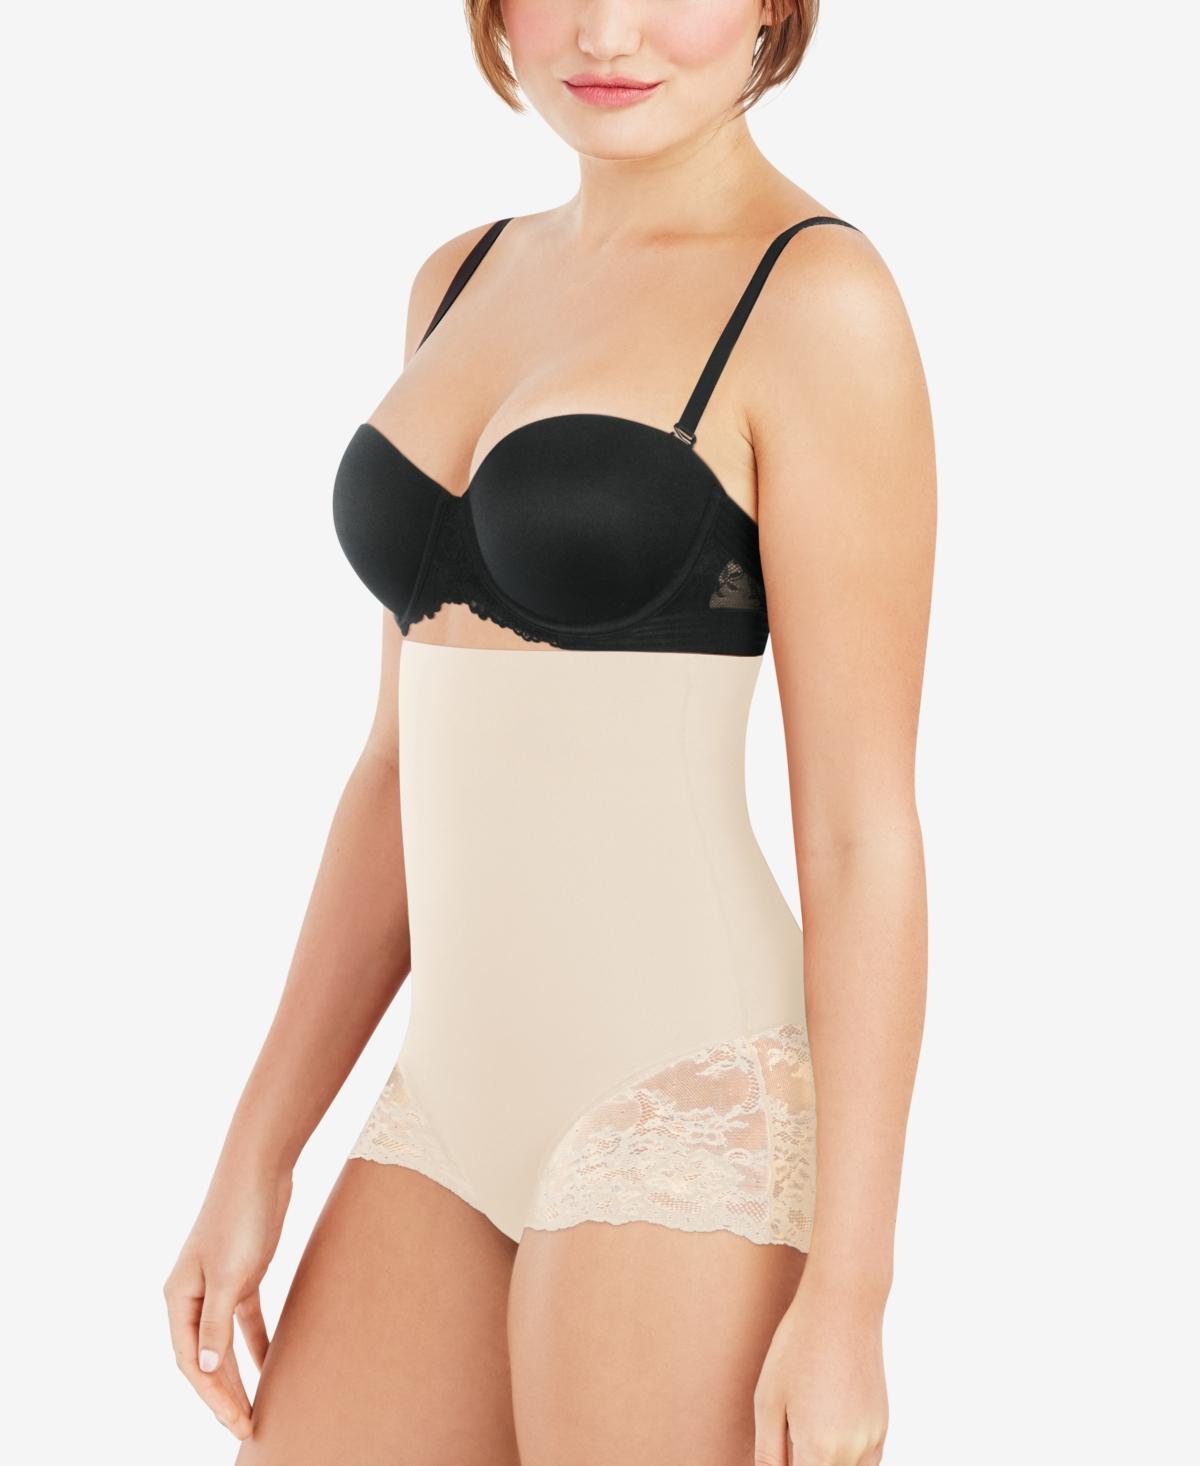 Maidenform Women's Tame Your Tummy High Waist Lace Brief DMS704